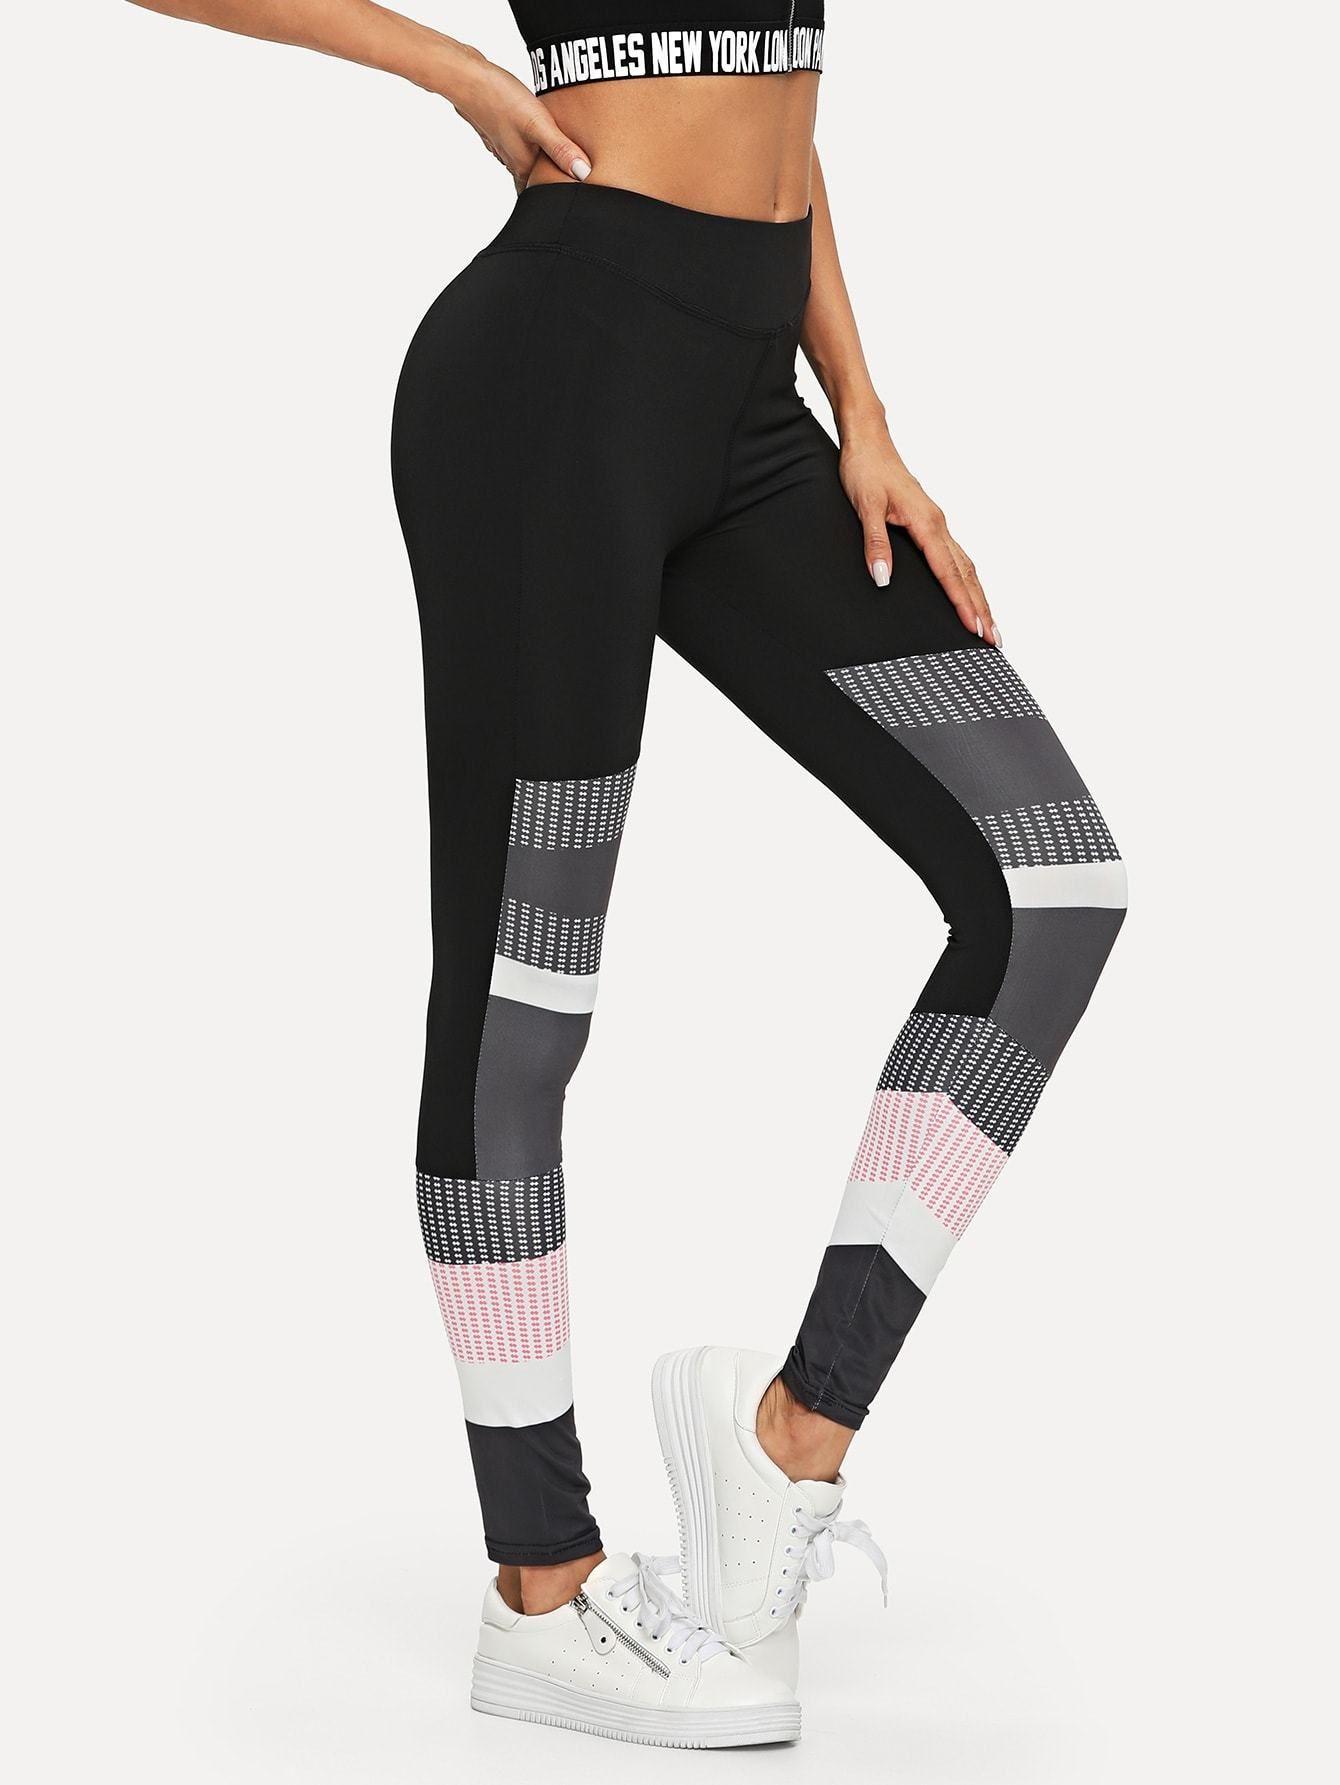 c1f49d5214656c color block leggings. #leggings #bottoms #women #fashion   Fitness ...